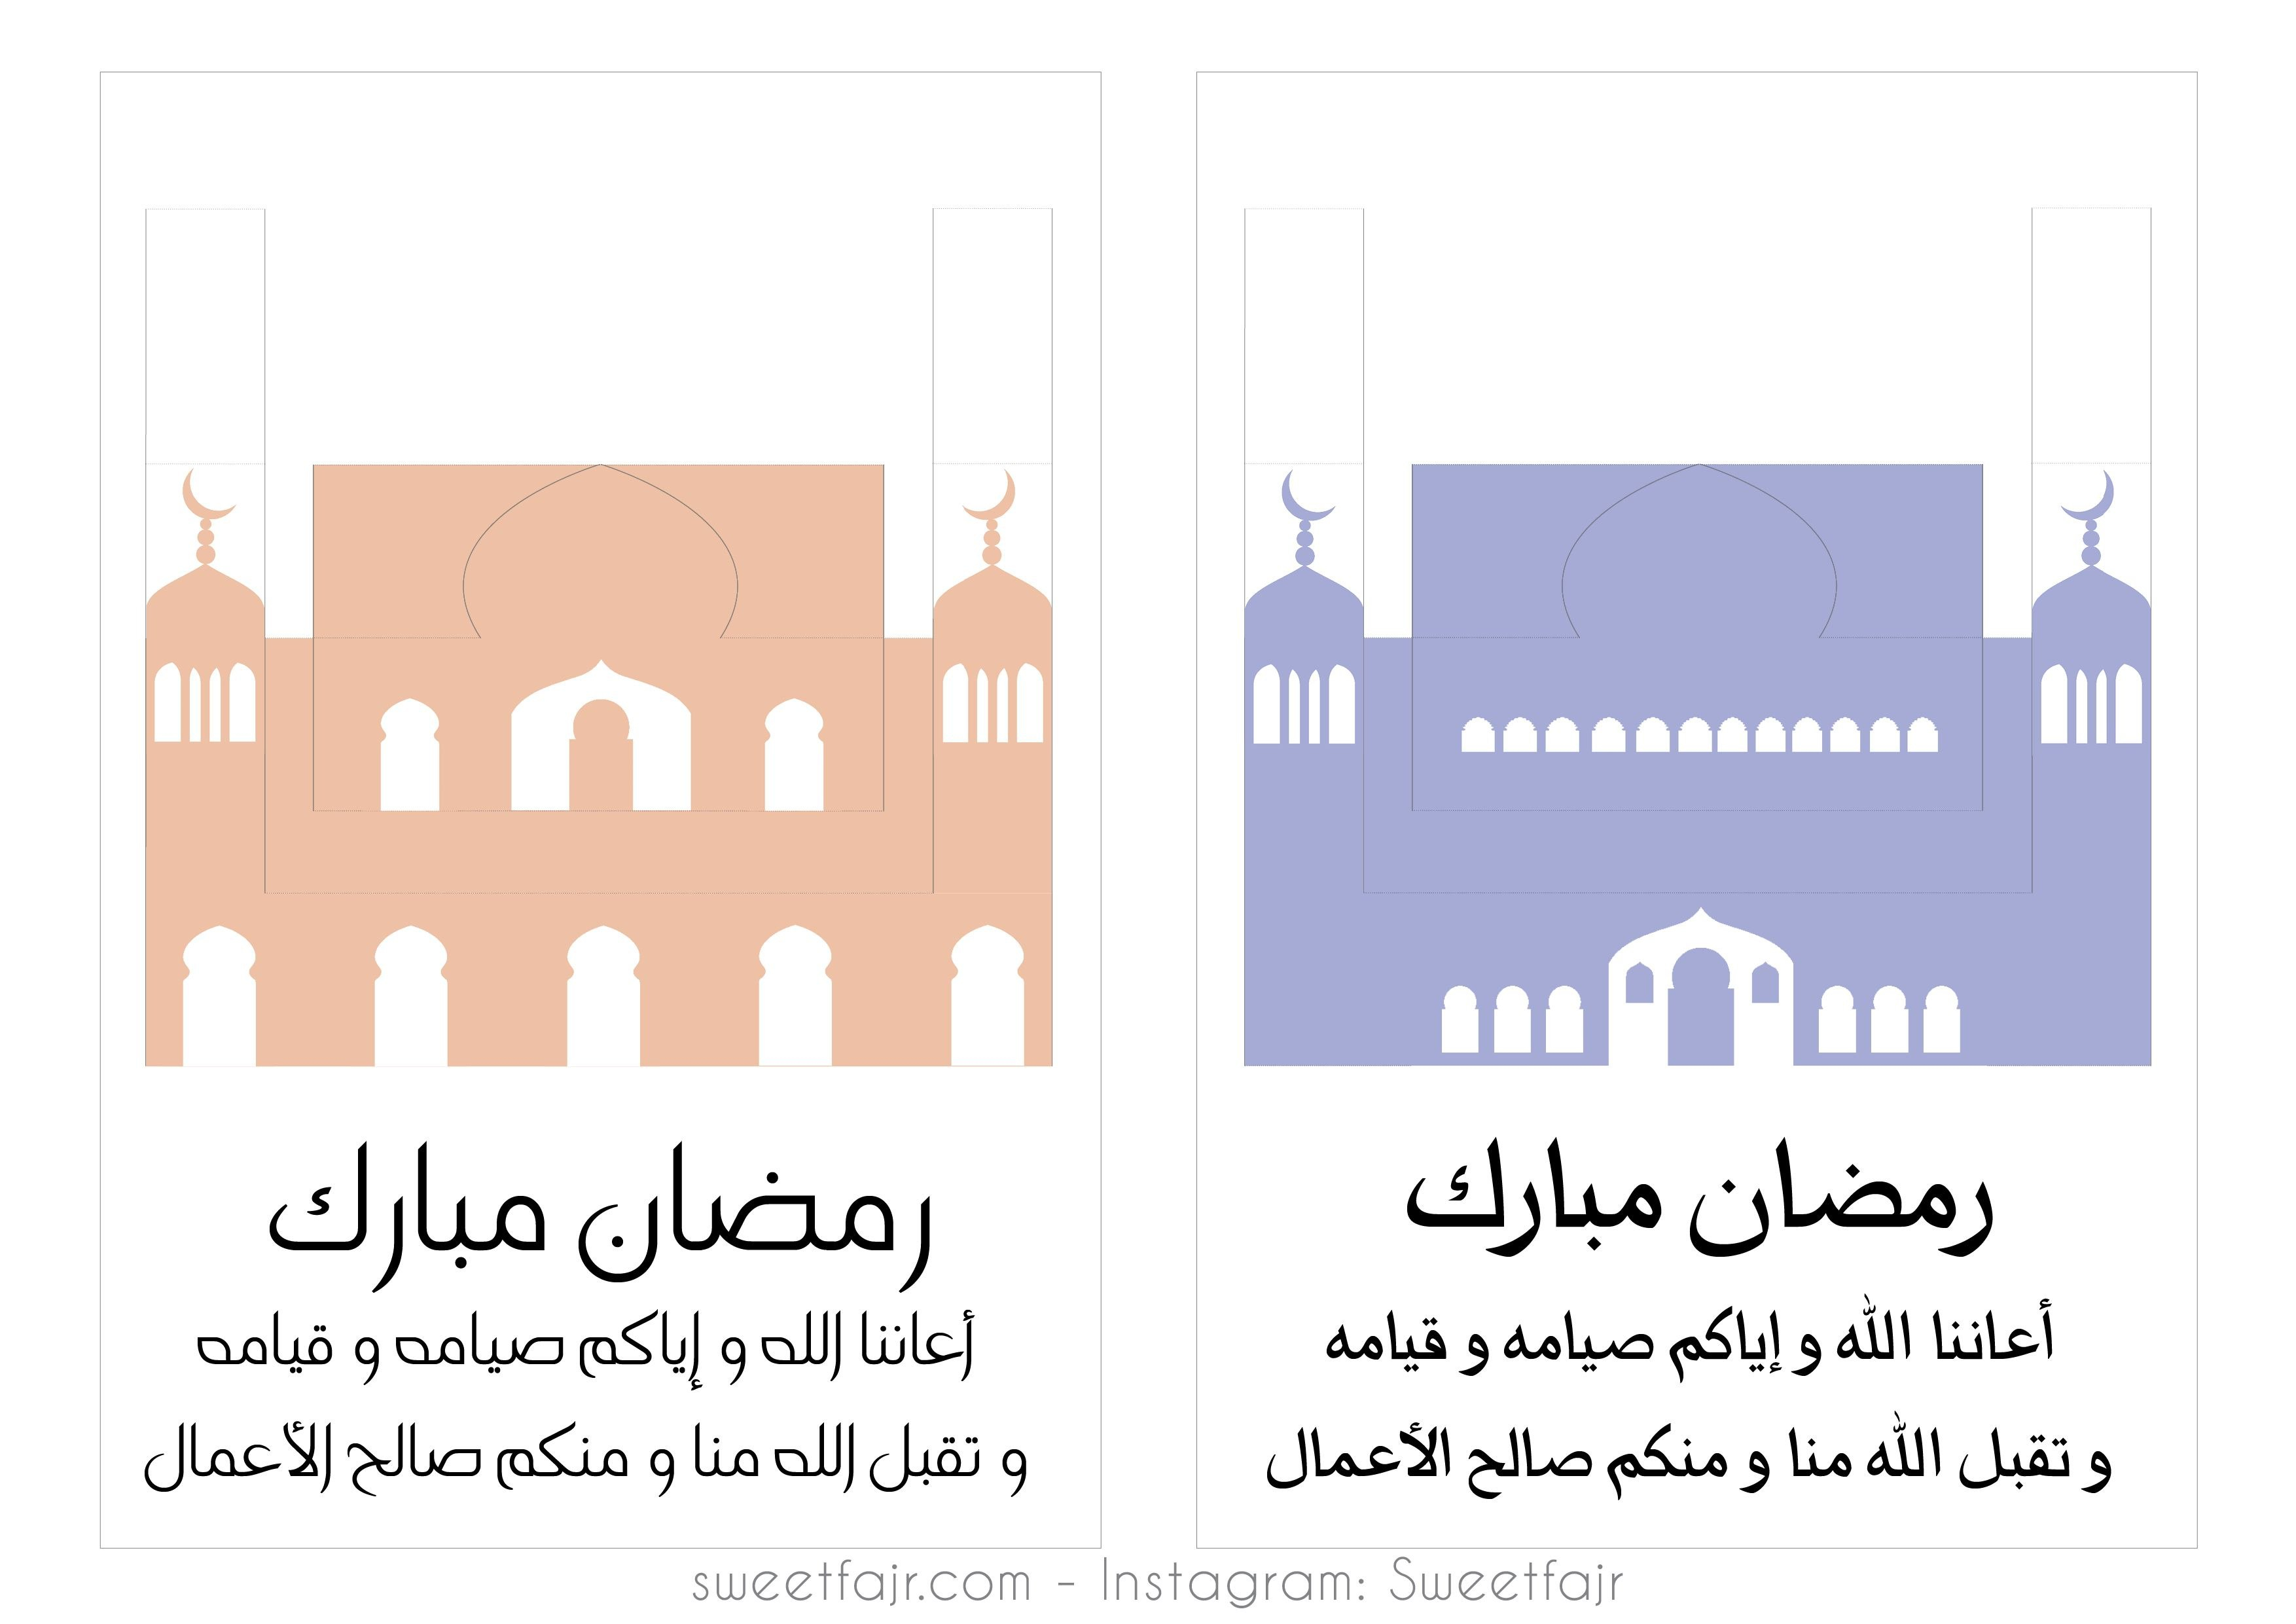 Pop Up Card Templates For Ramadan  Free Printable Popup Mosque Throughout Pop Up Card Templates Free Printable